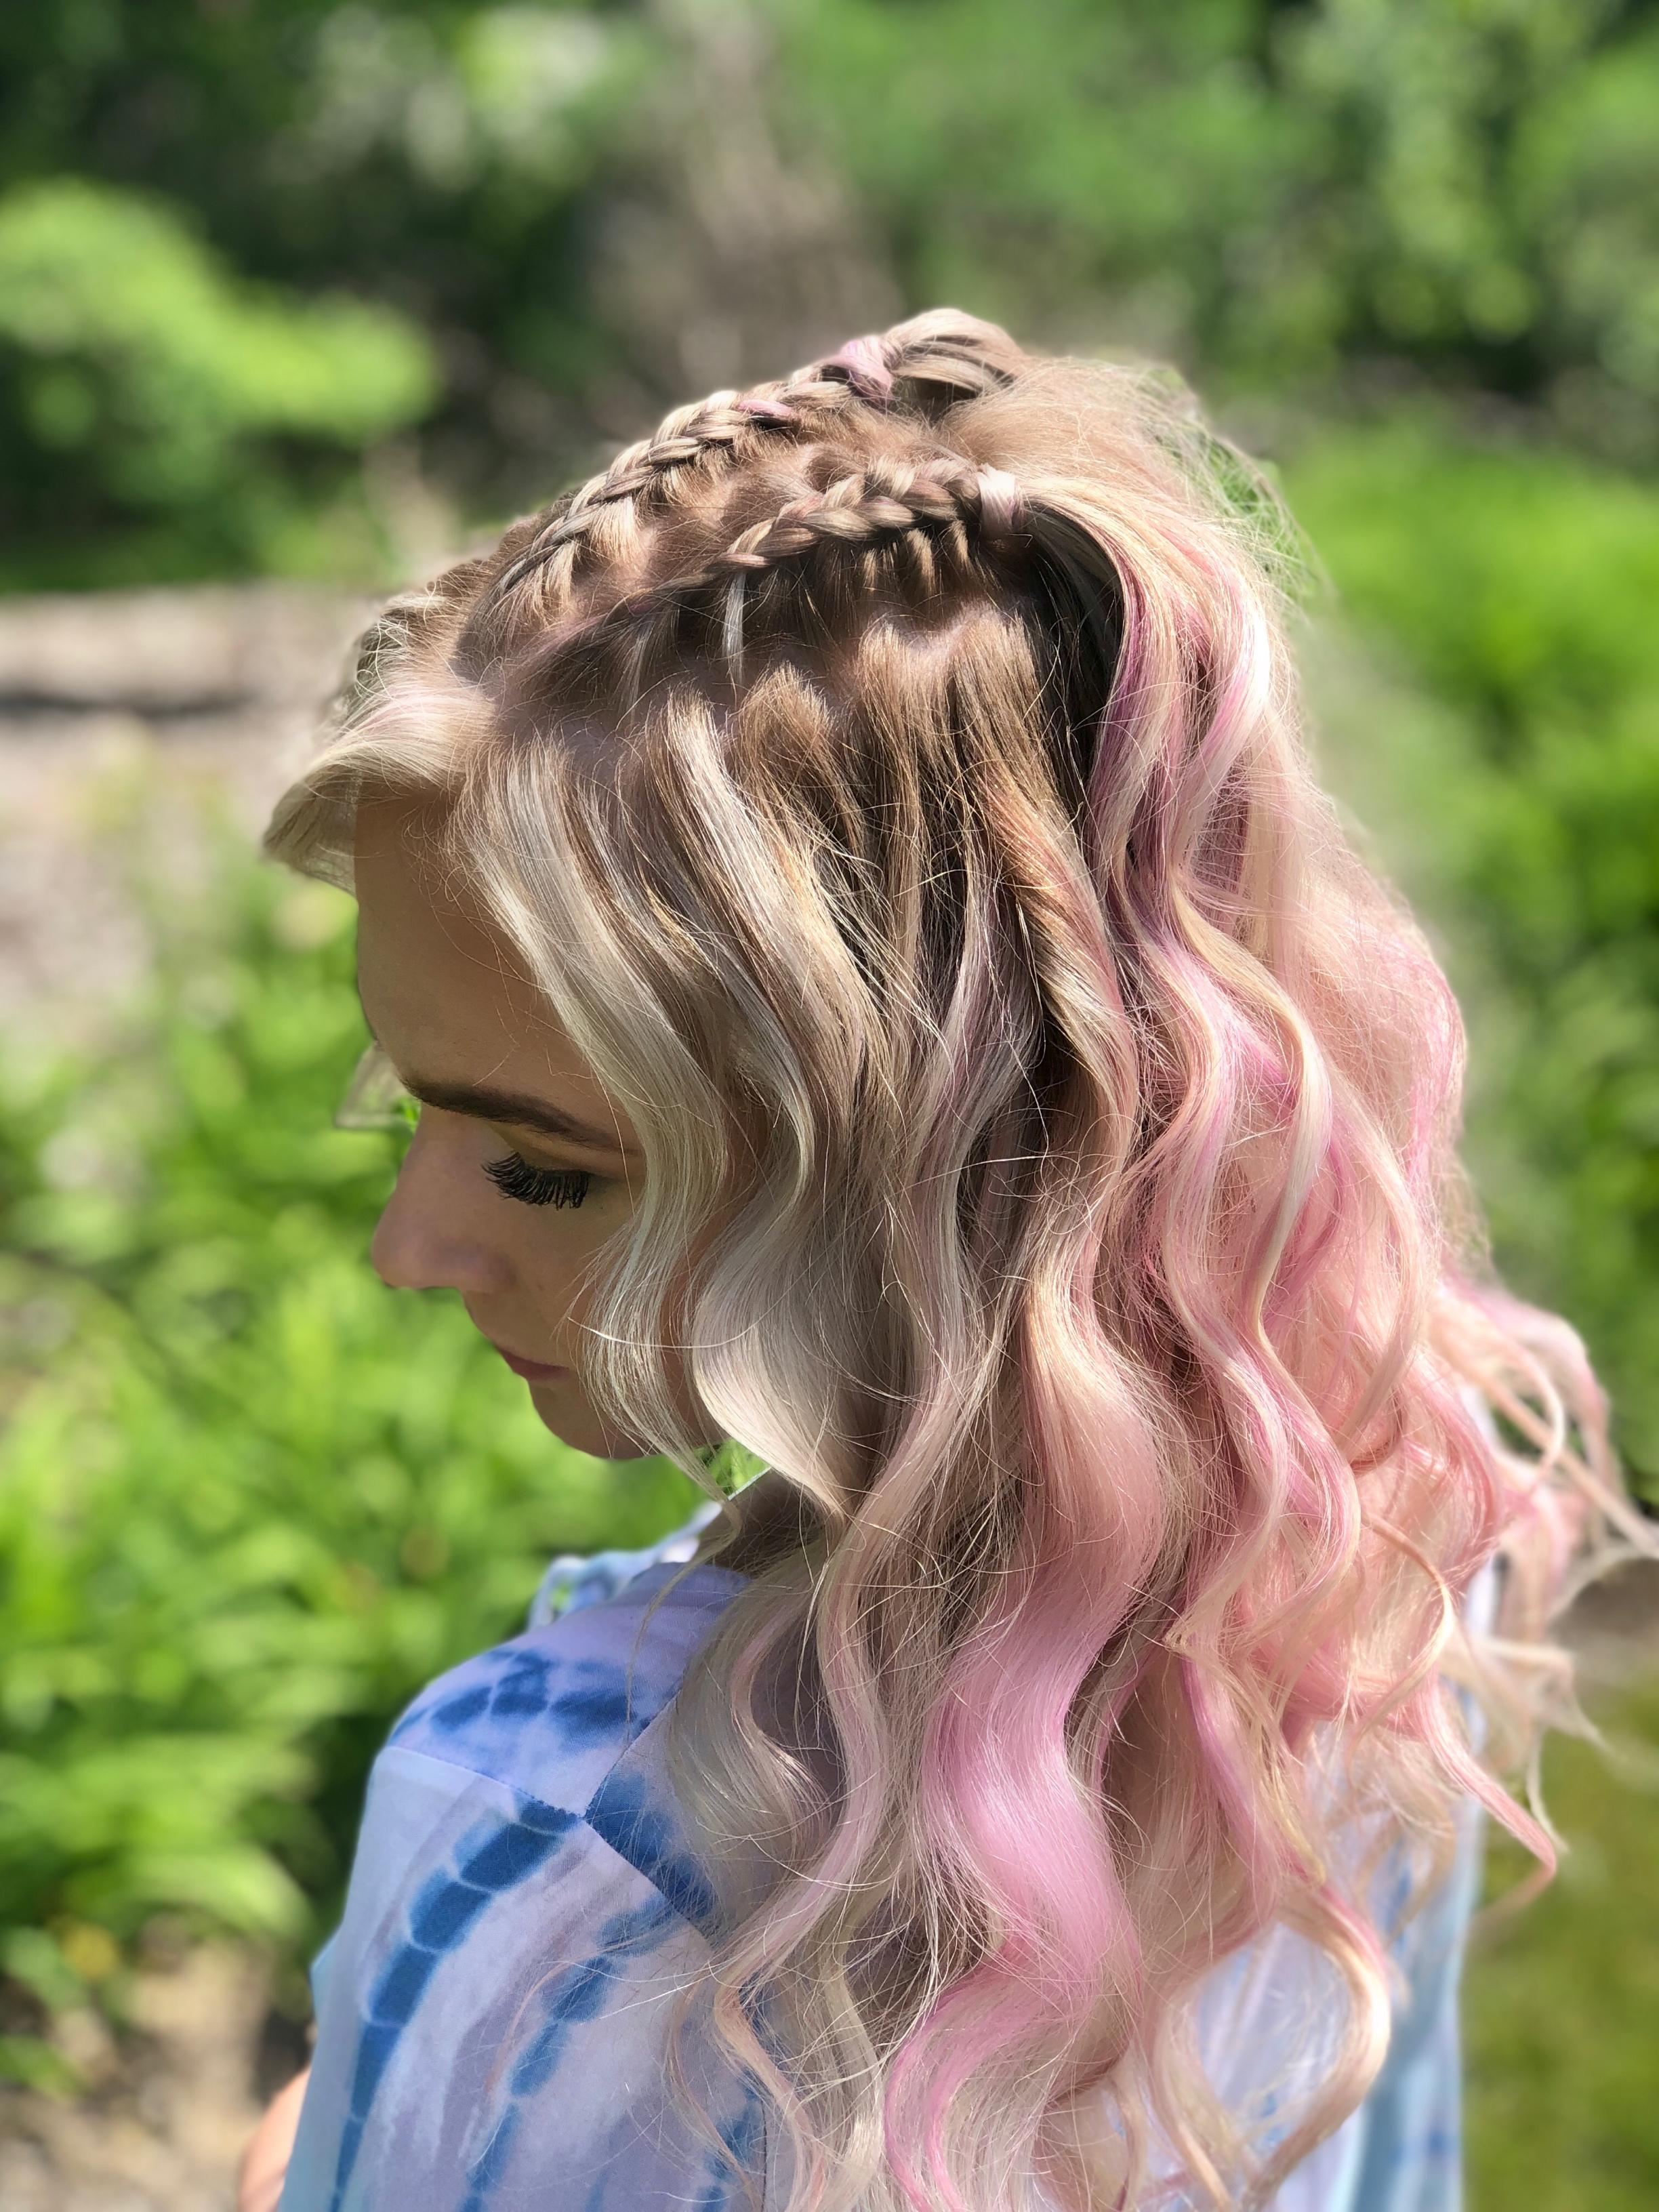 terra salon festival hair pink braids matrix lash extensions.jpeg